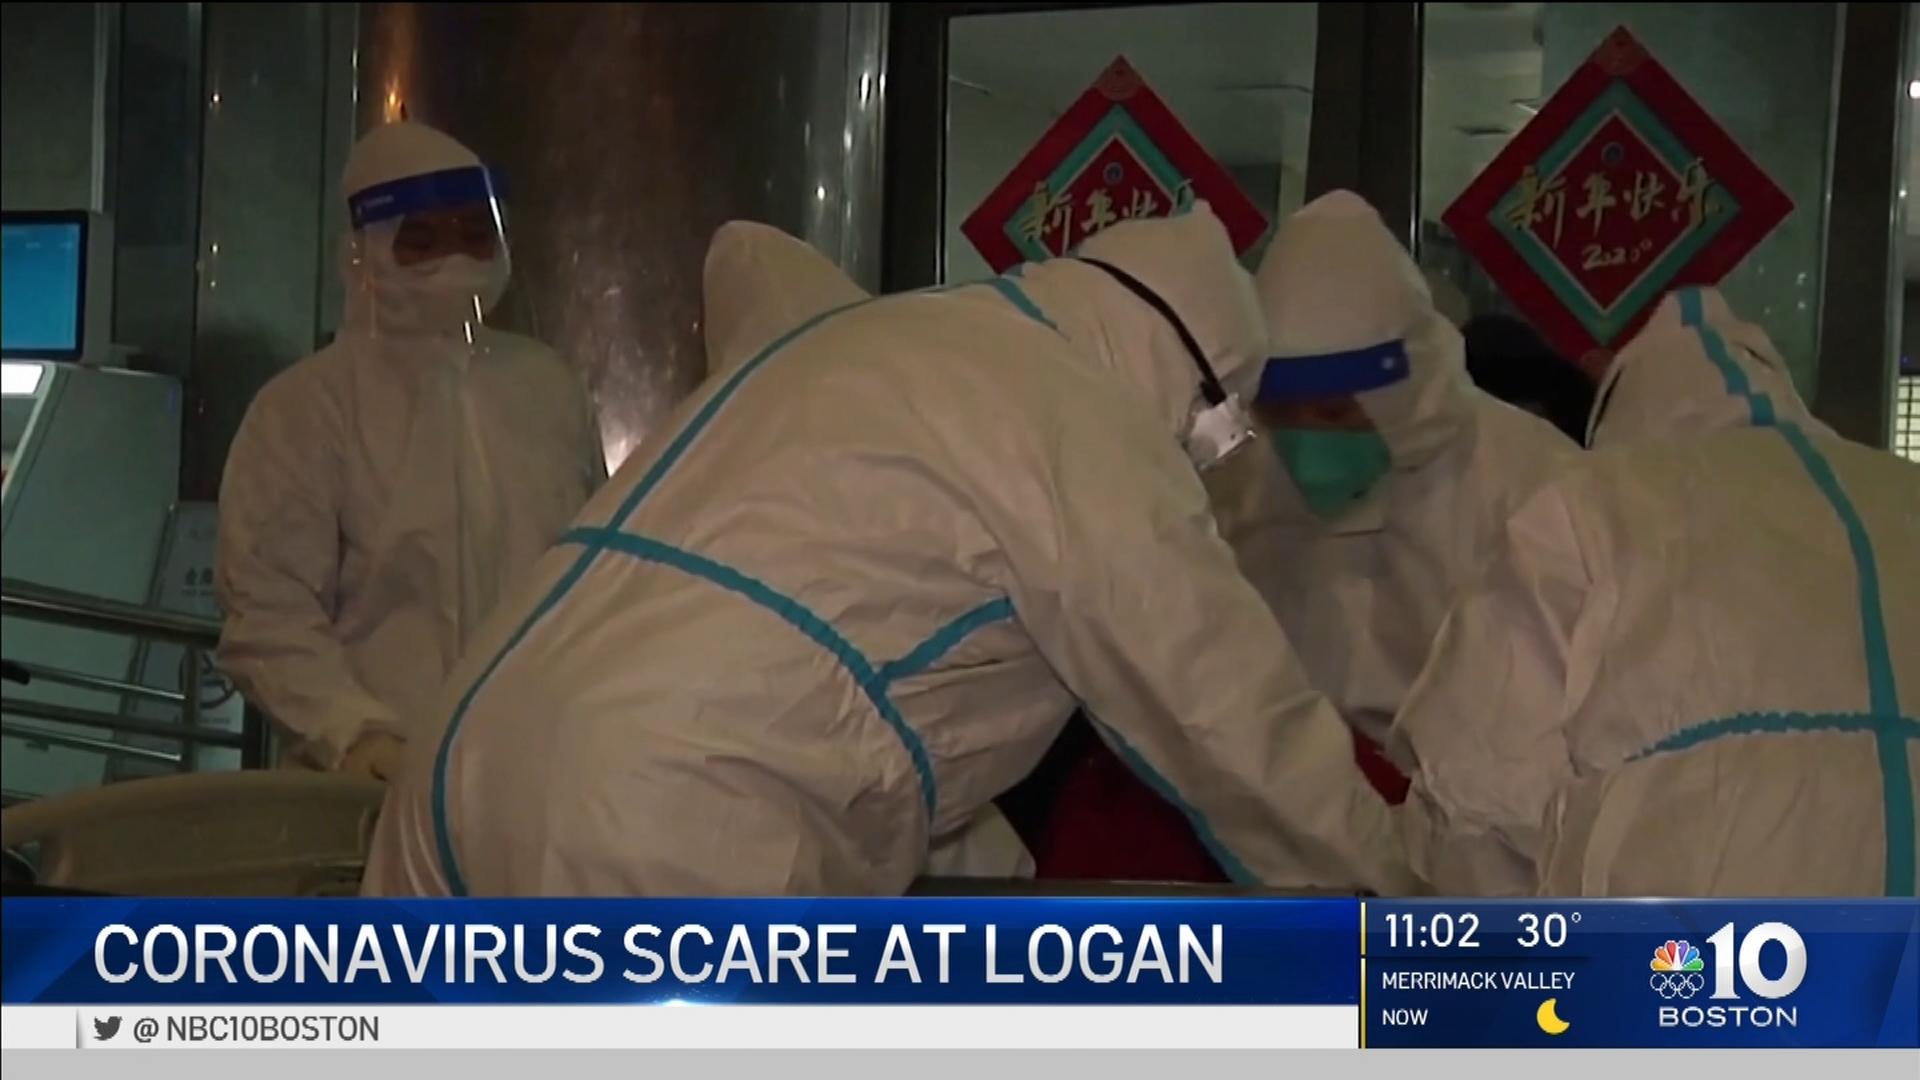 Coronavirus Scare at Logan – NBC Boston